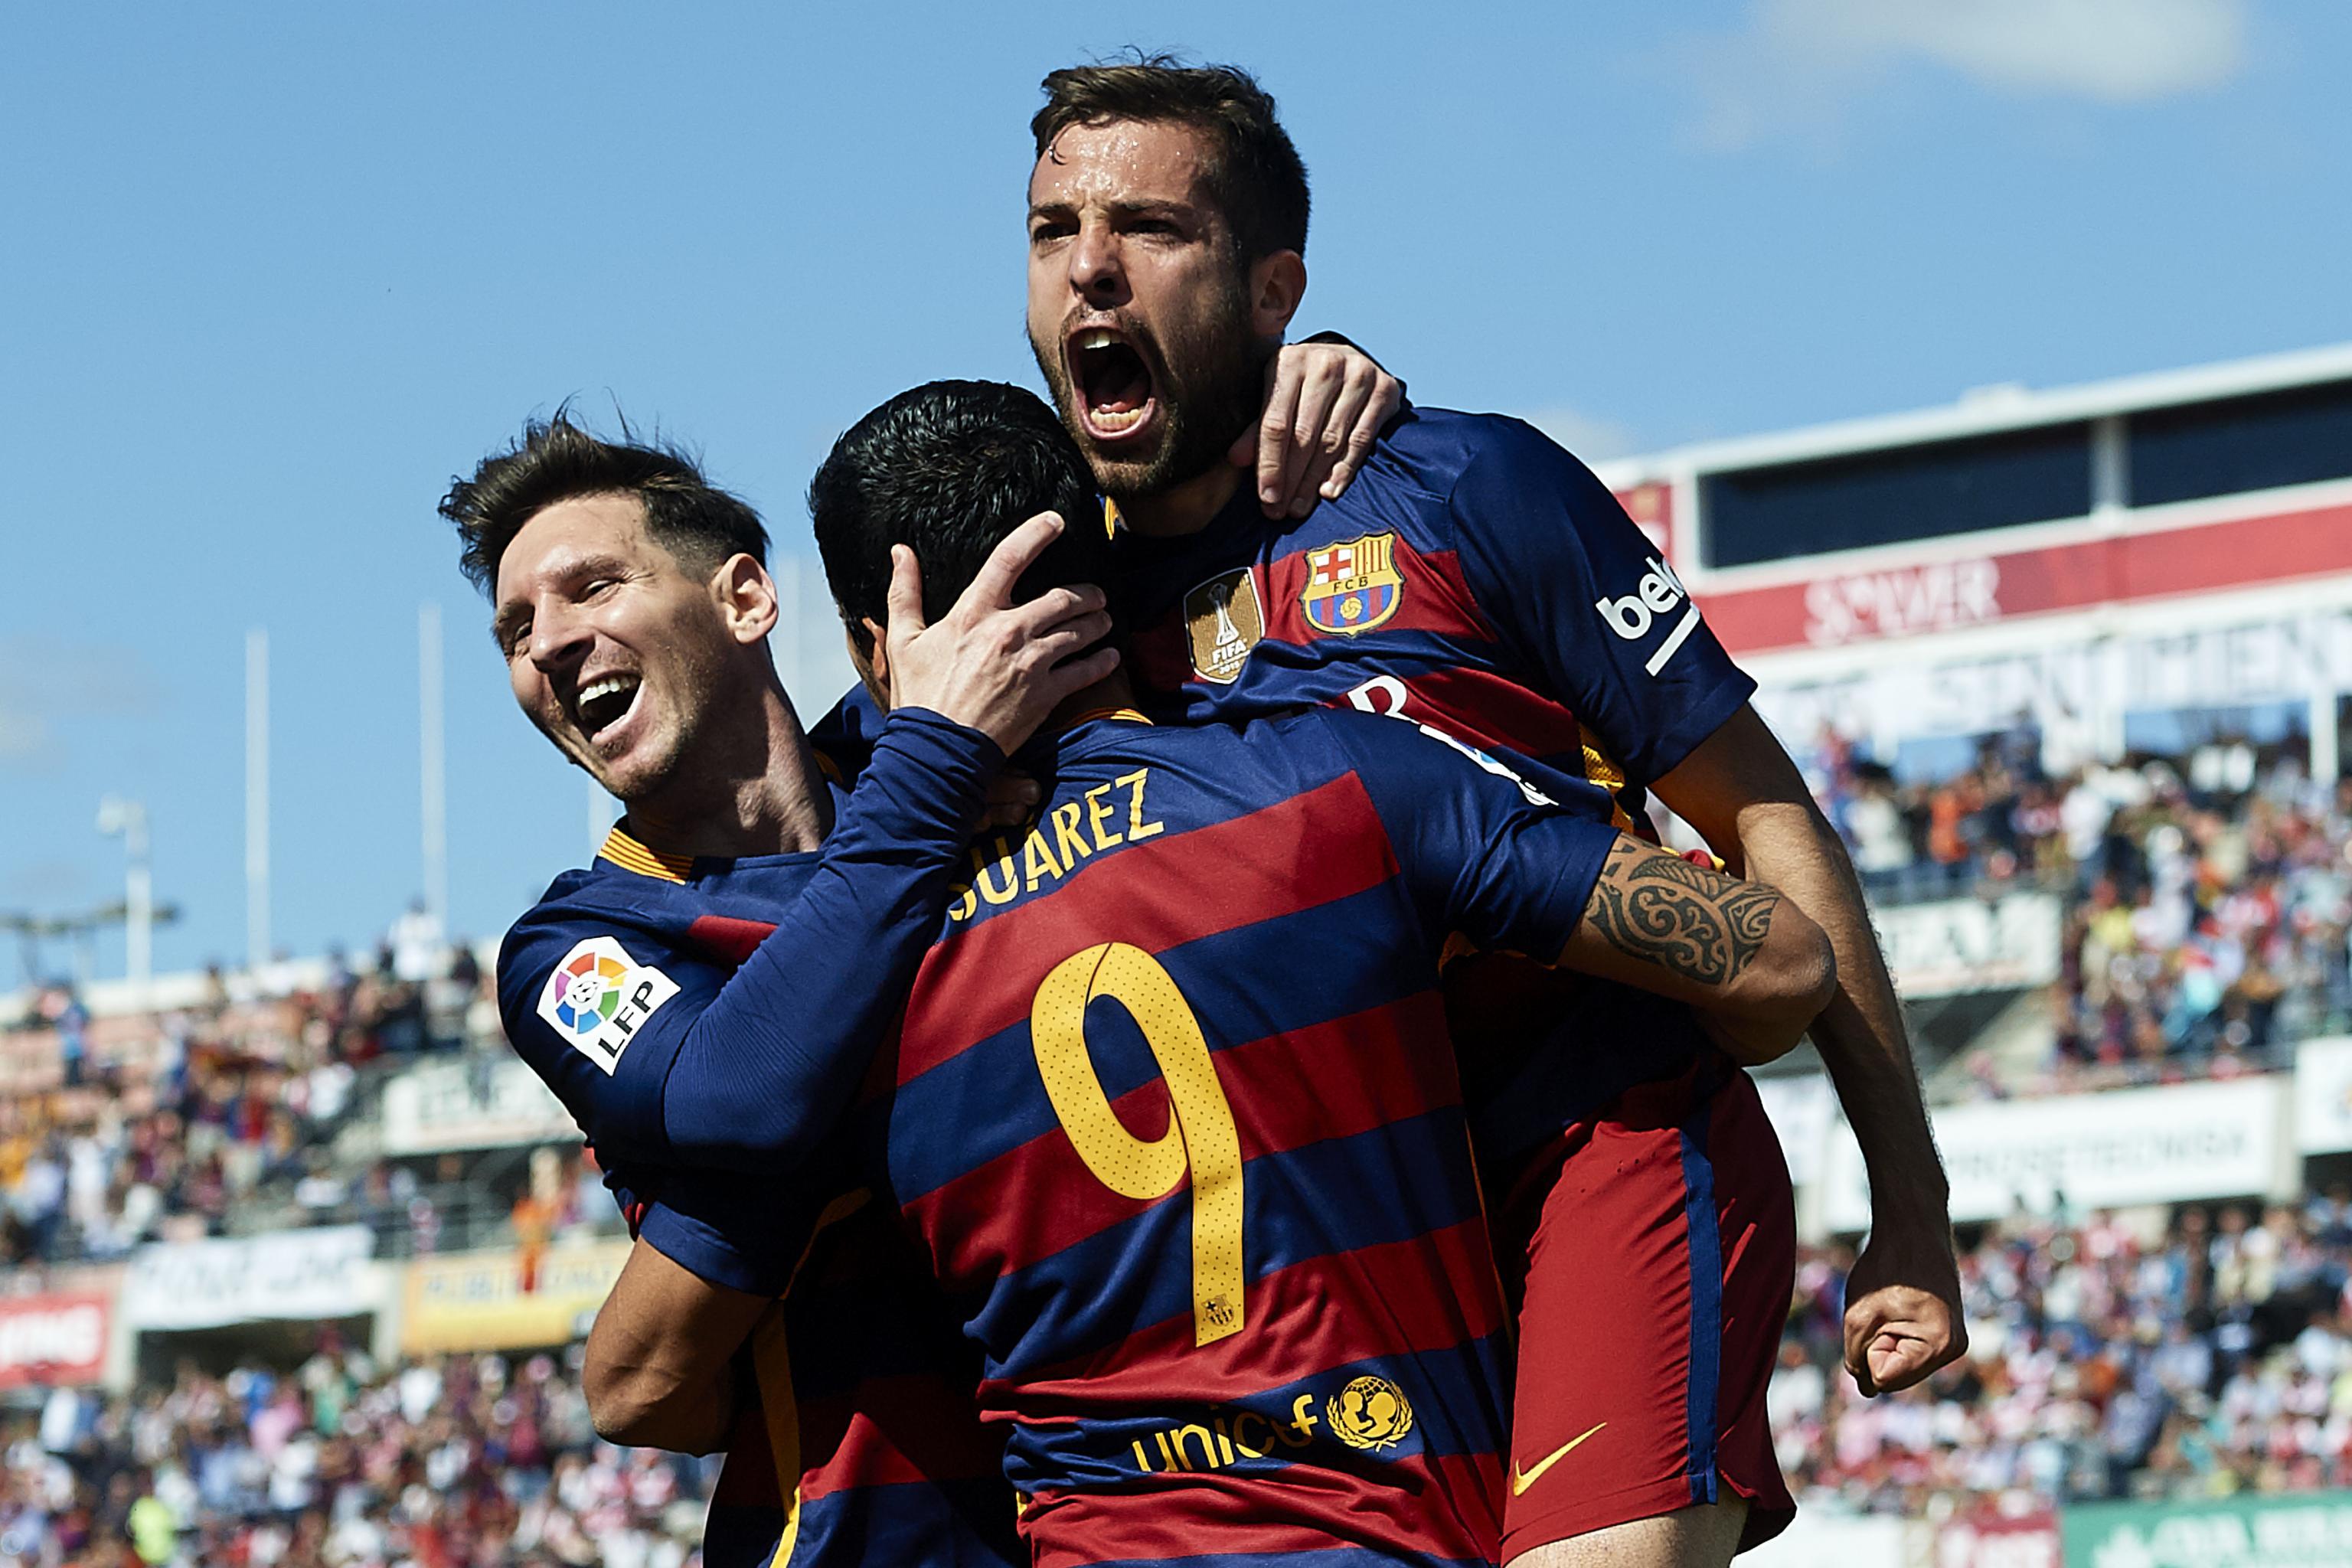 Granada Vs Barcelona Score Reaction From 2016 La Liga Game Bleacher Report Latest News Videos And Highlights